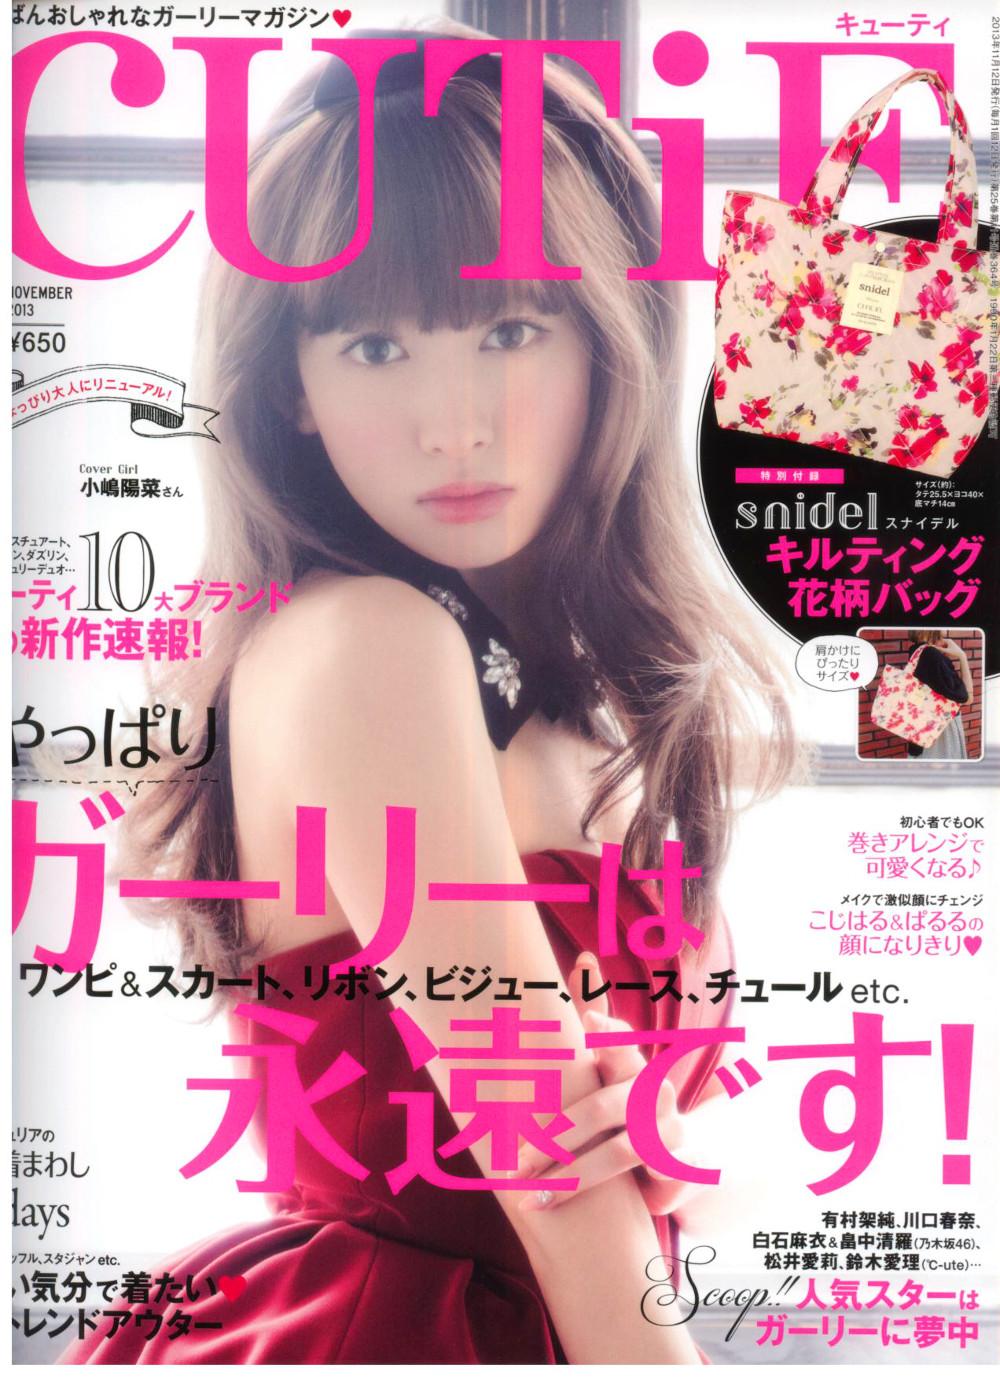 CUTiE 2013年11月 小嶋陽菜 表紙